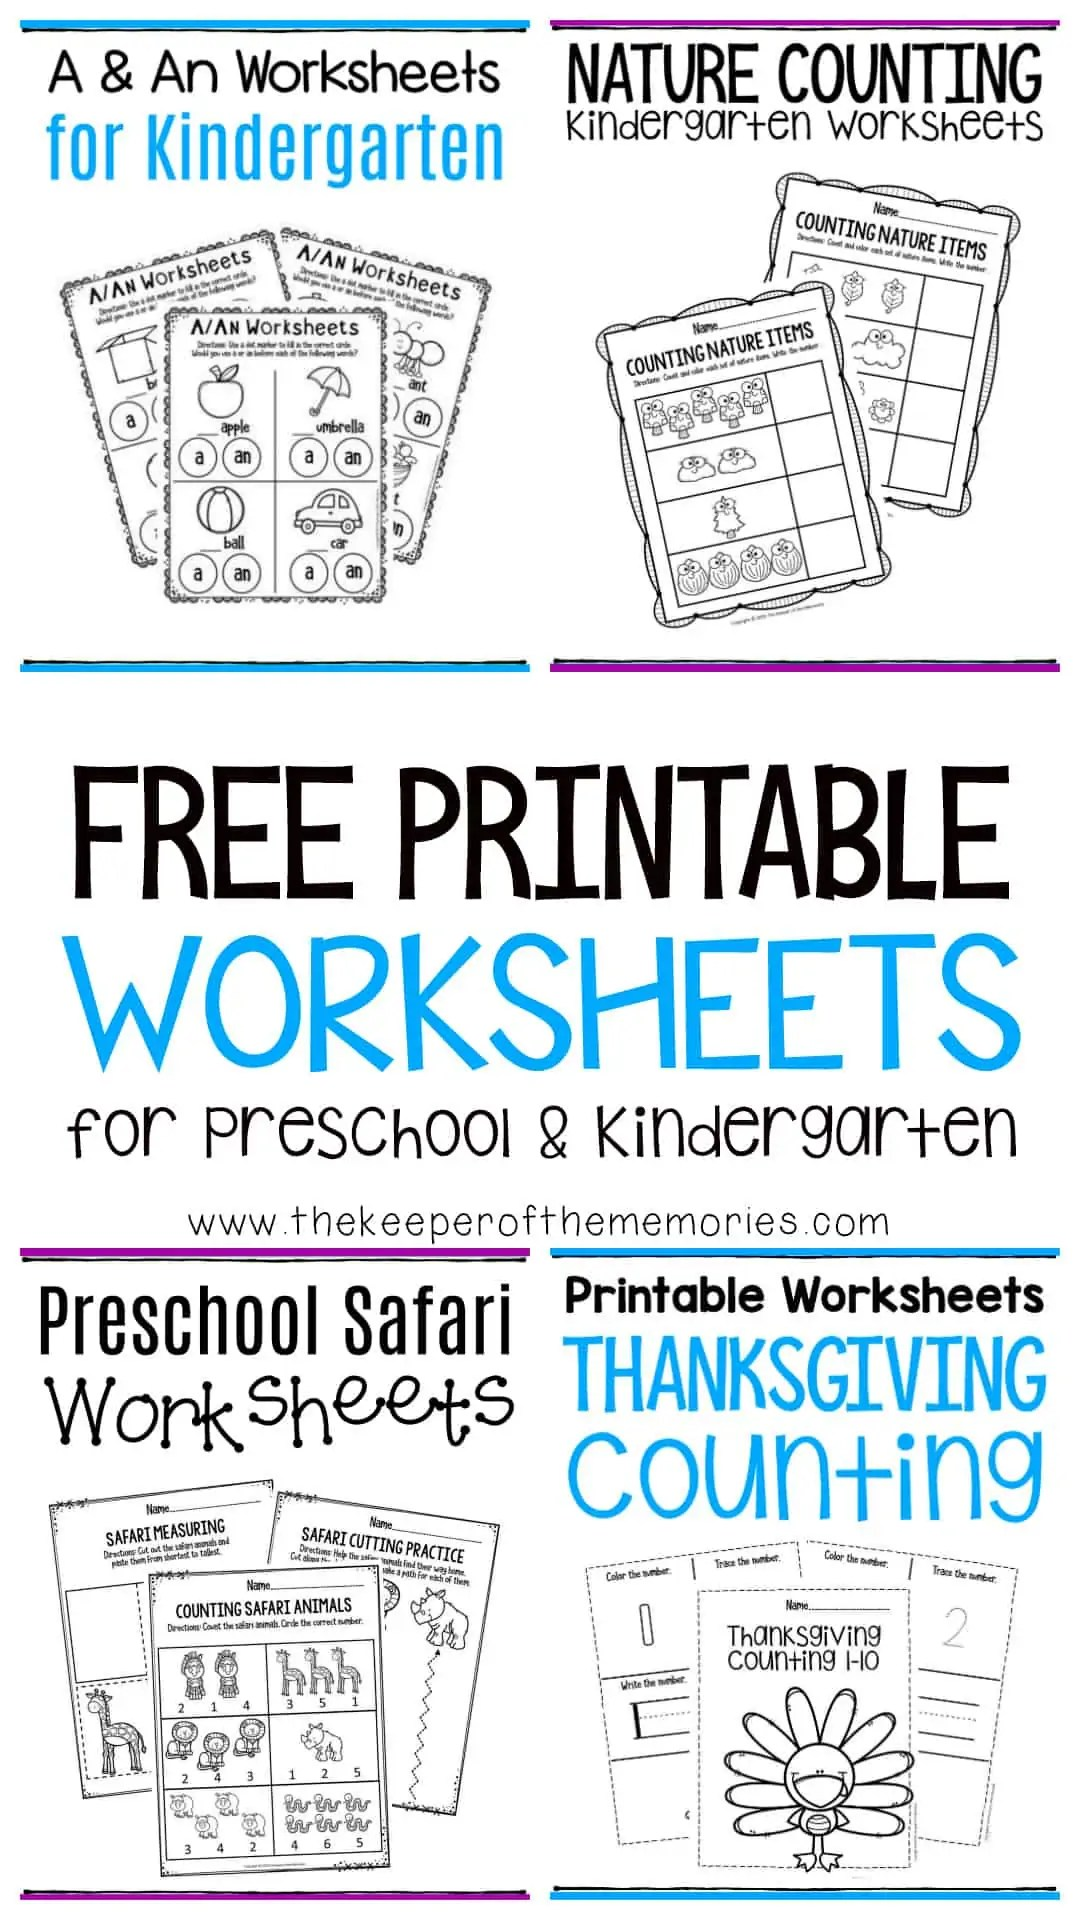 Free Printable Worksheets For Preschool Amp Kindergarten